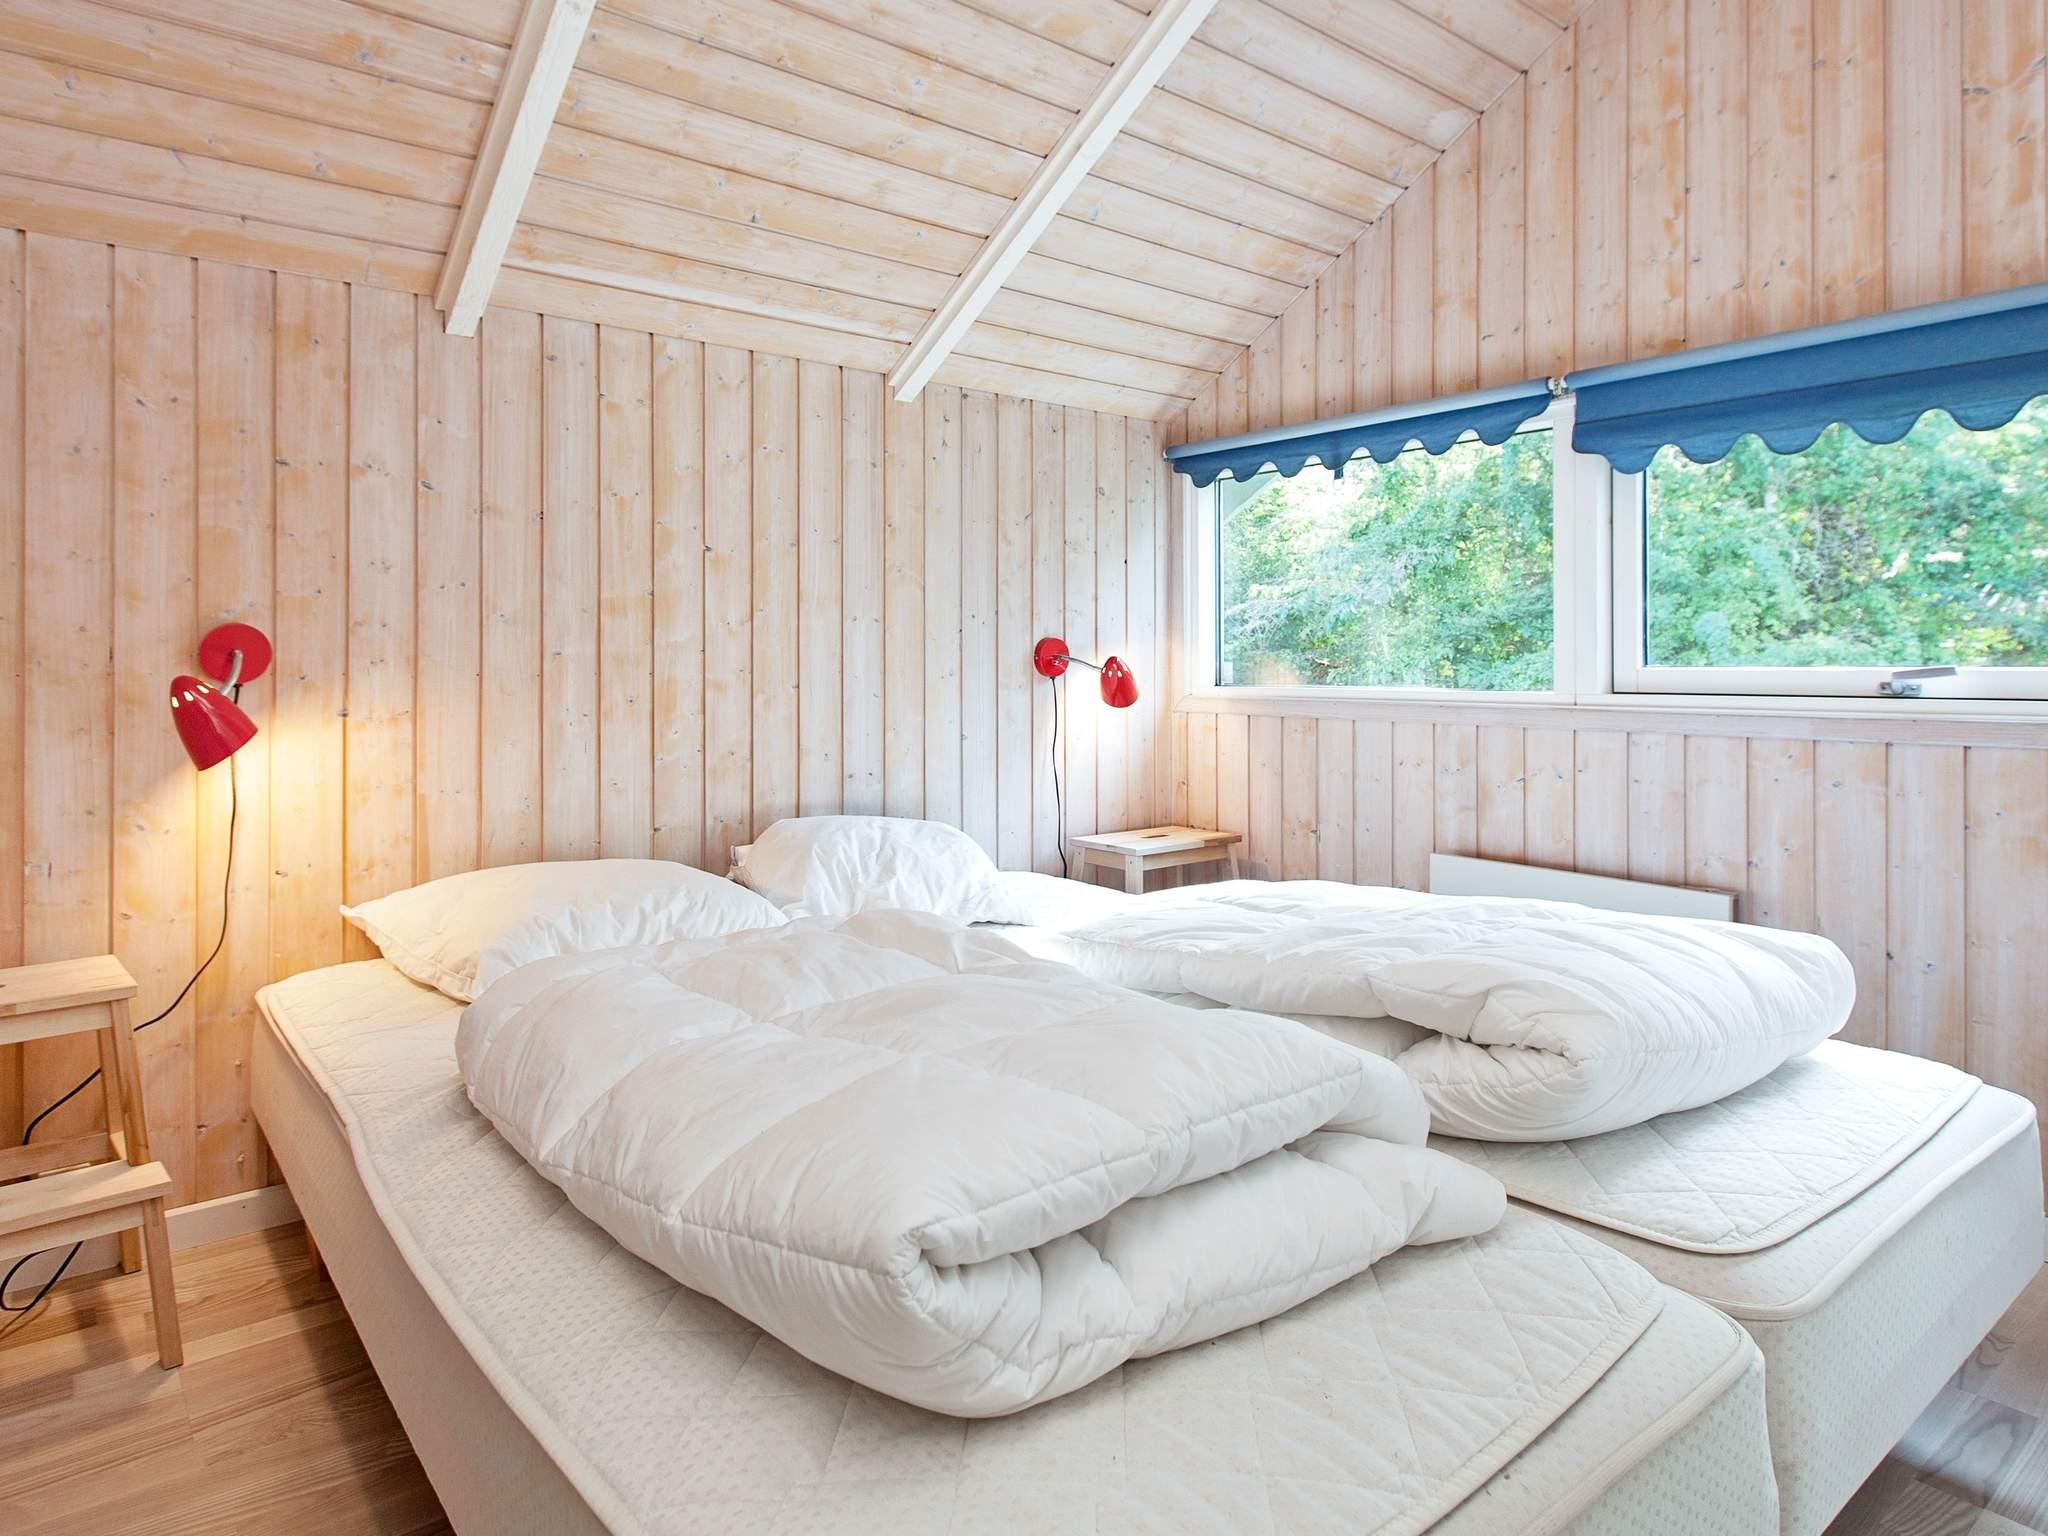 Ferienhaus Holløselund Strand (87423), Holløse, , Nordseeland, Dänemark, Bild 10